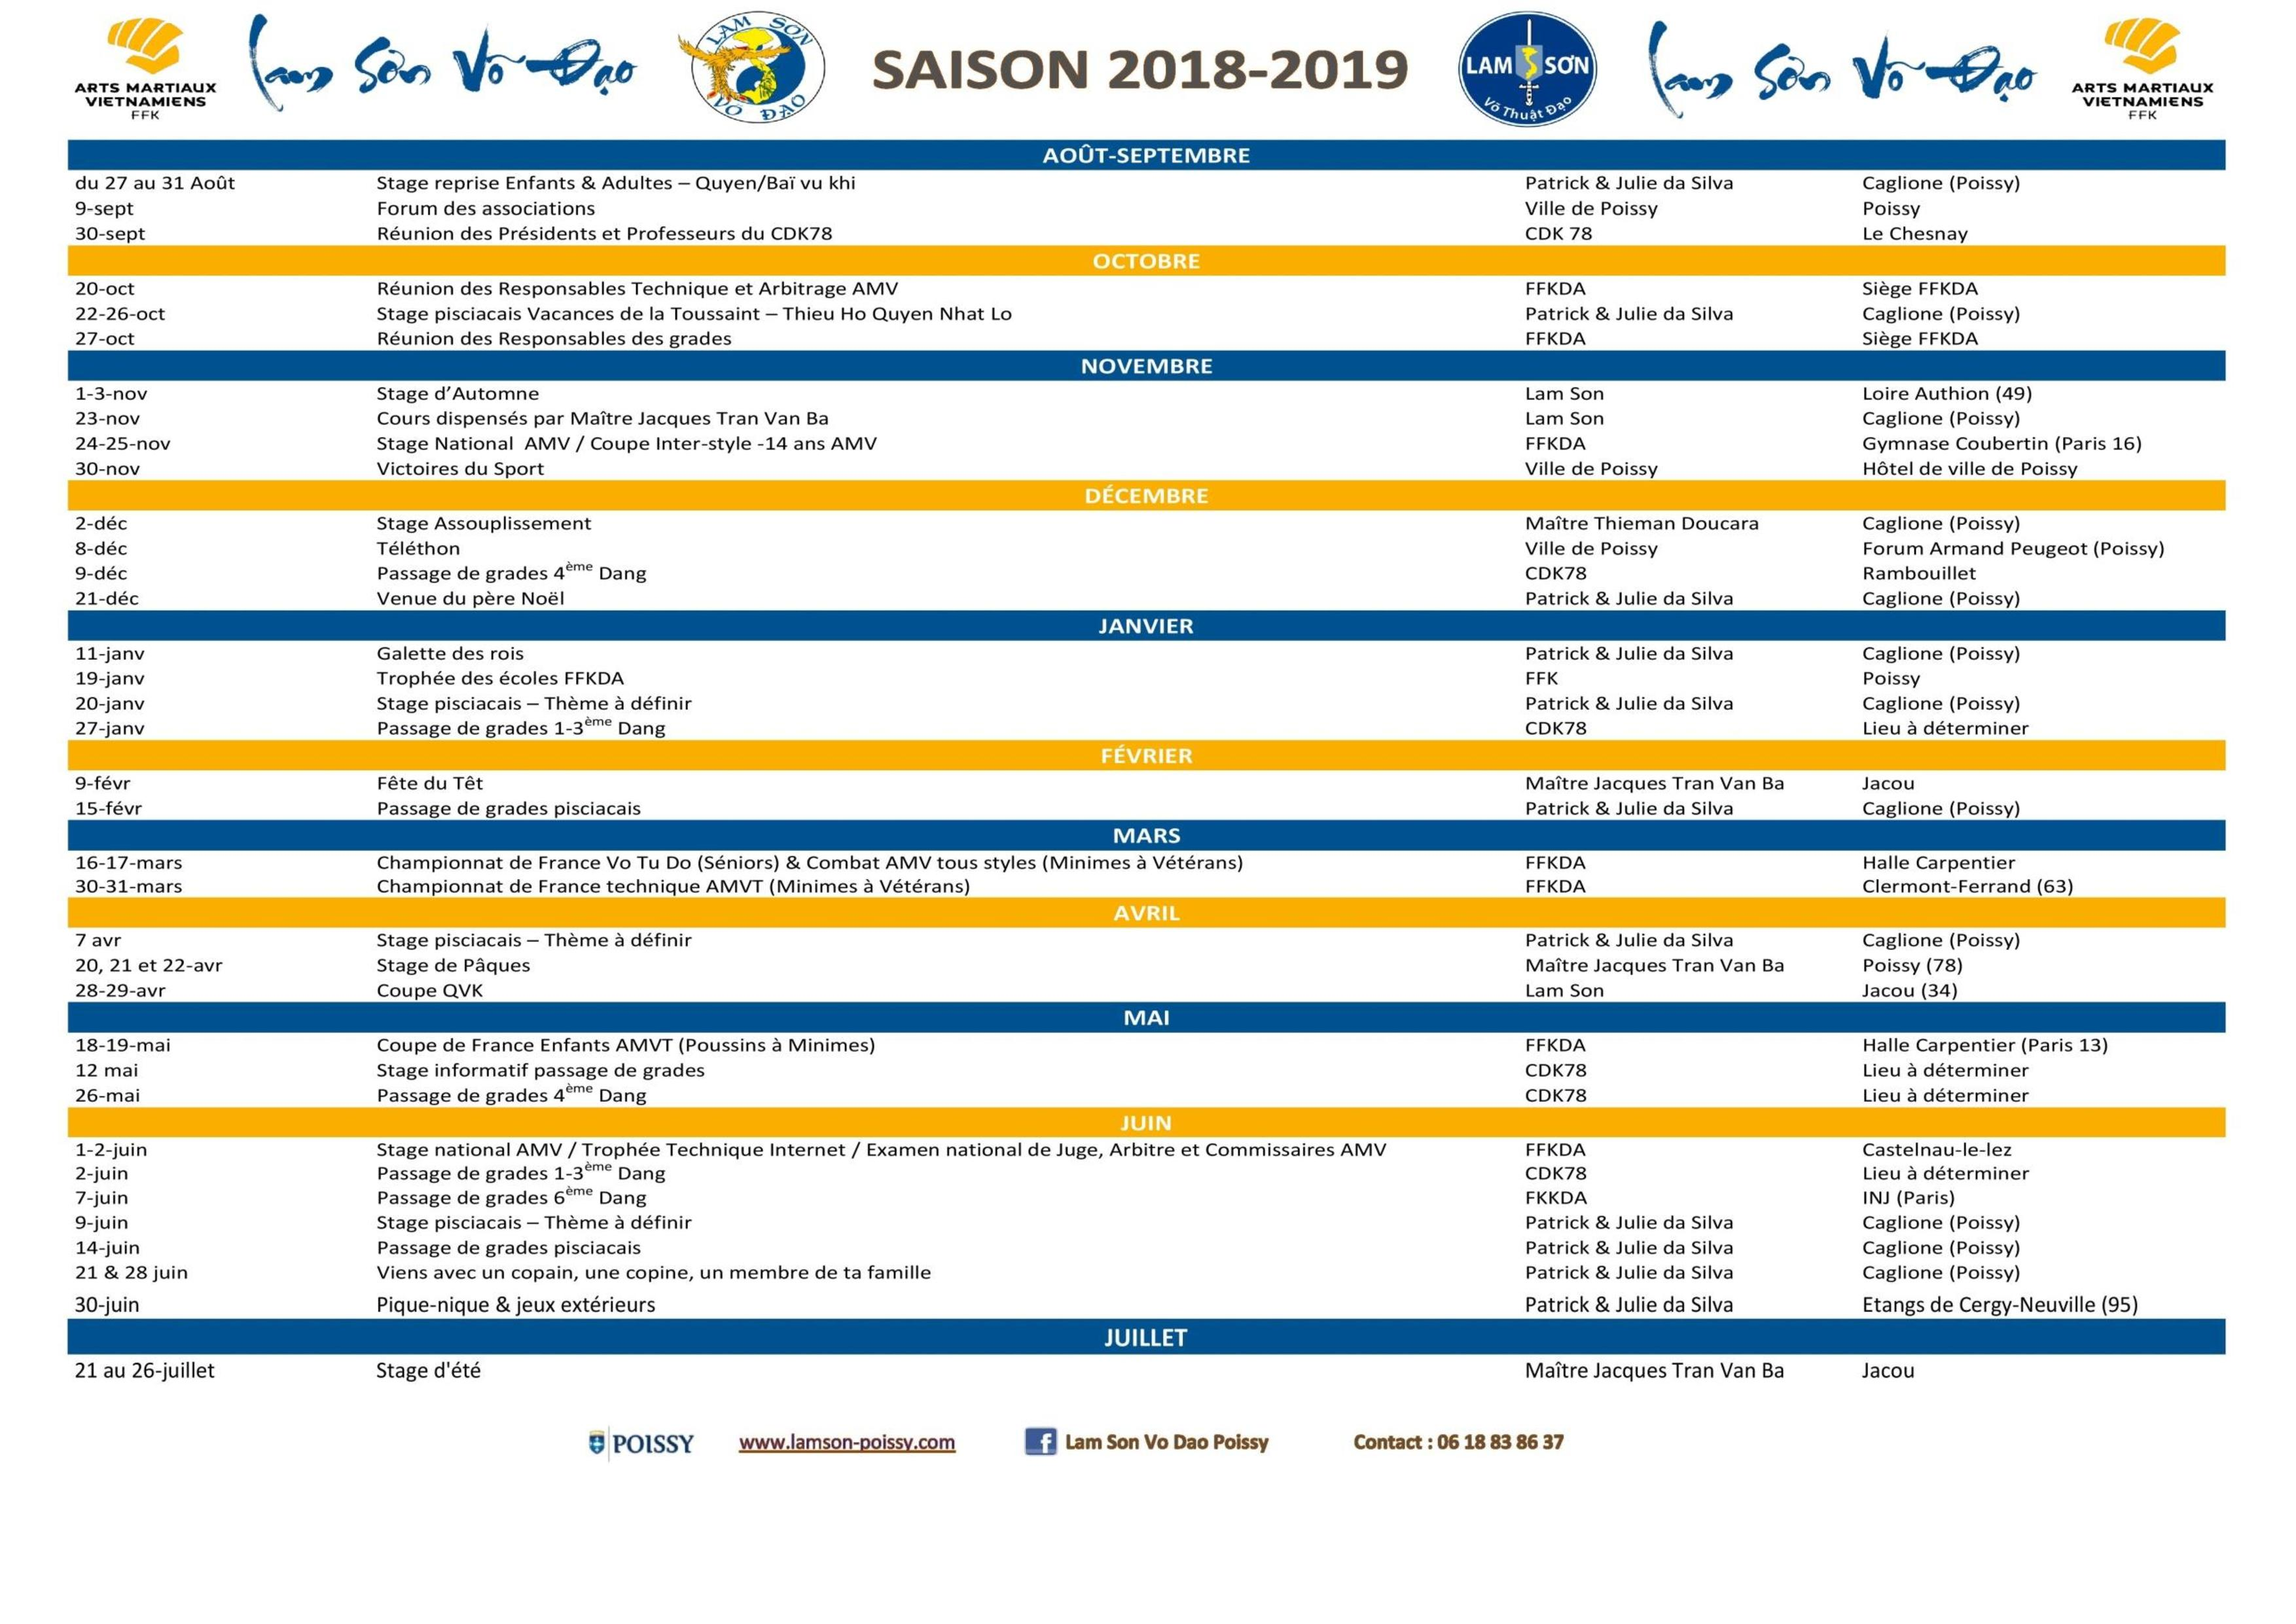 Calendrier Ffkda 2019 2020.Actualites Page 9 Sur 28 Lam Son Vo Dao Poissy